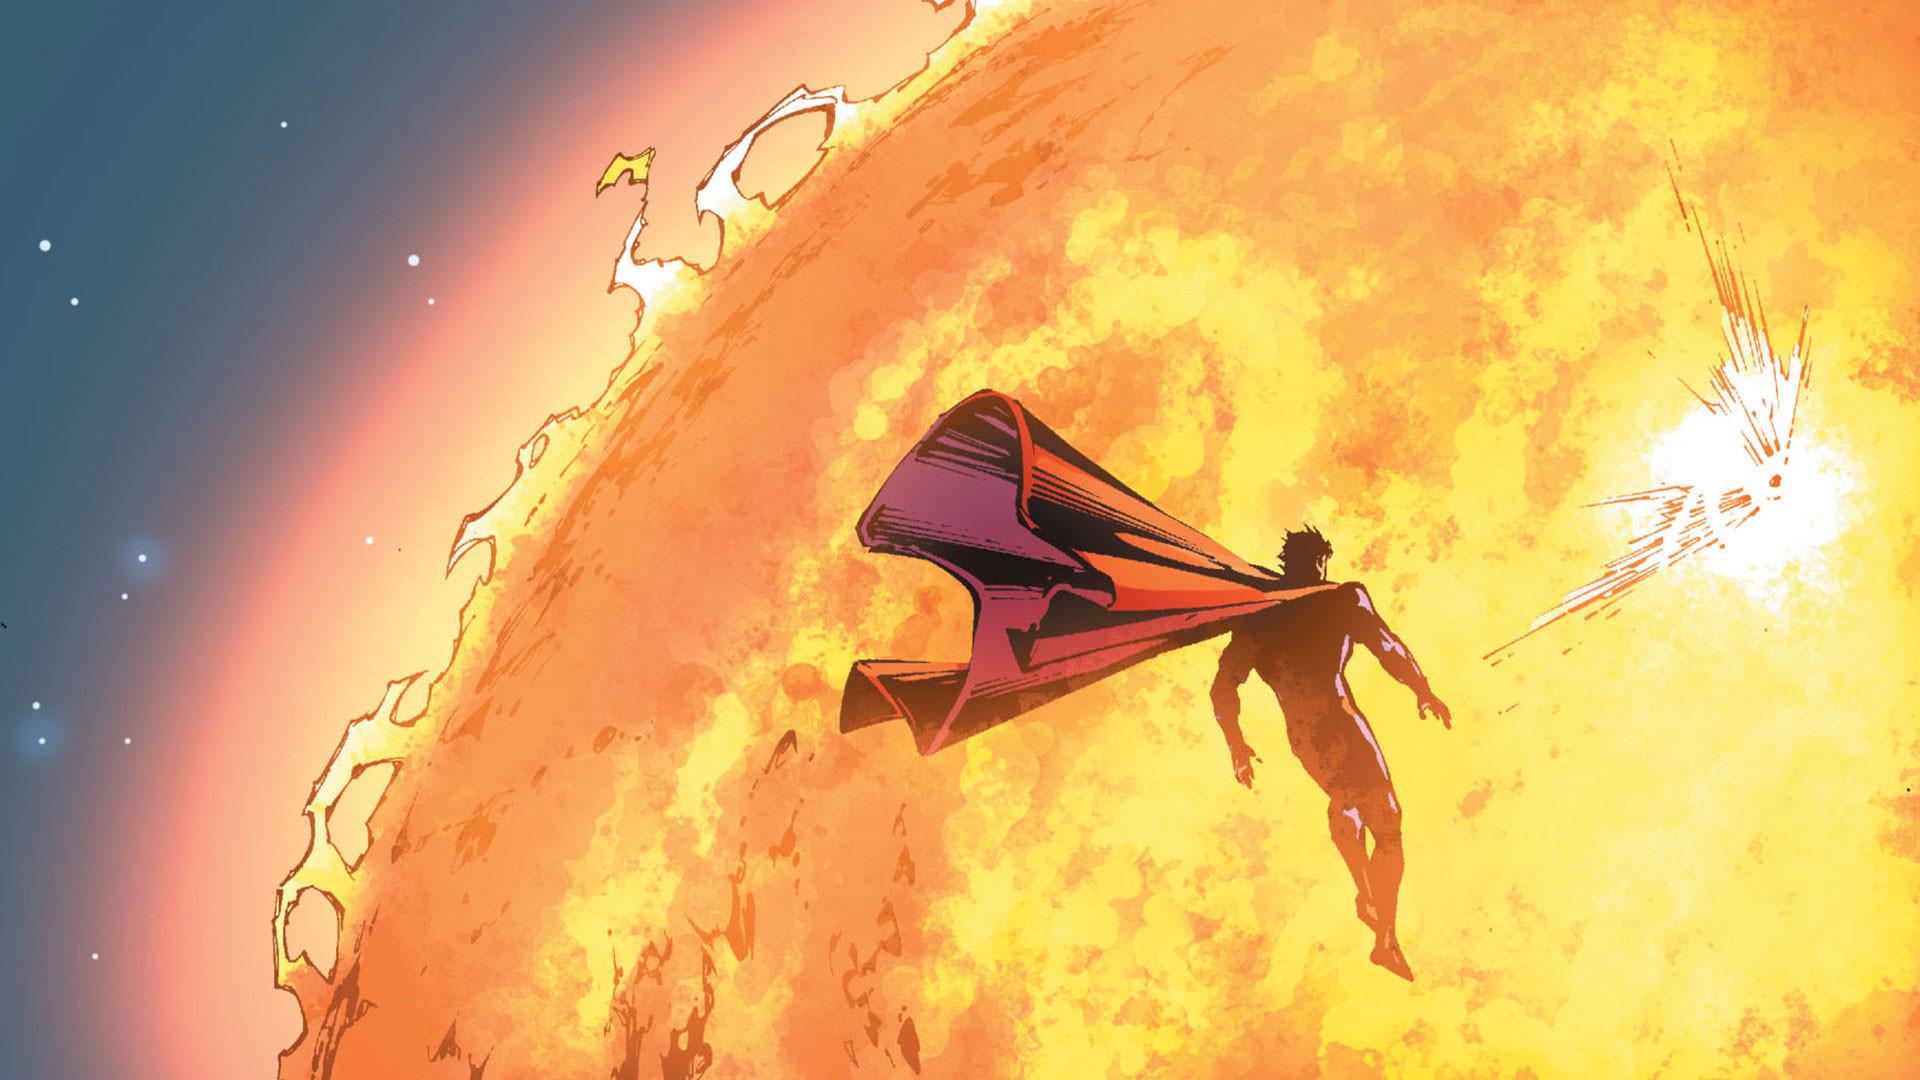 hd pics photos superman comic cartoon 2d animated hd quality desktop  background wallpaper